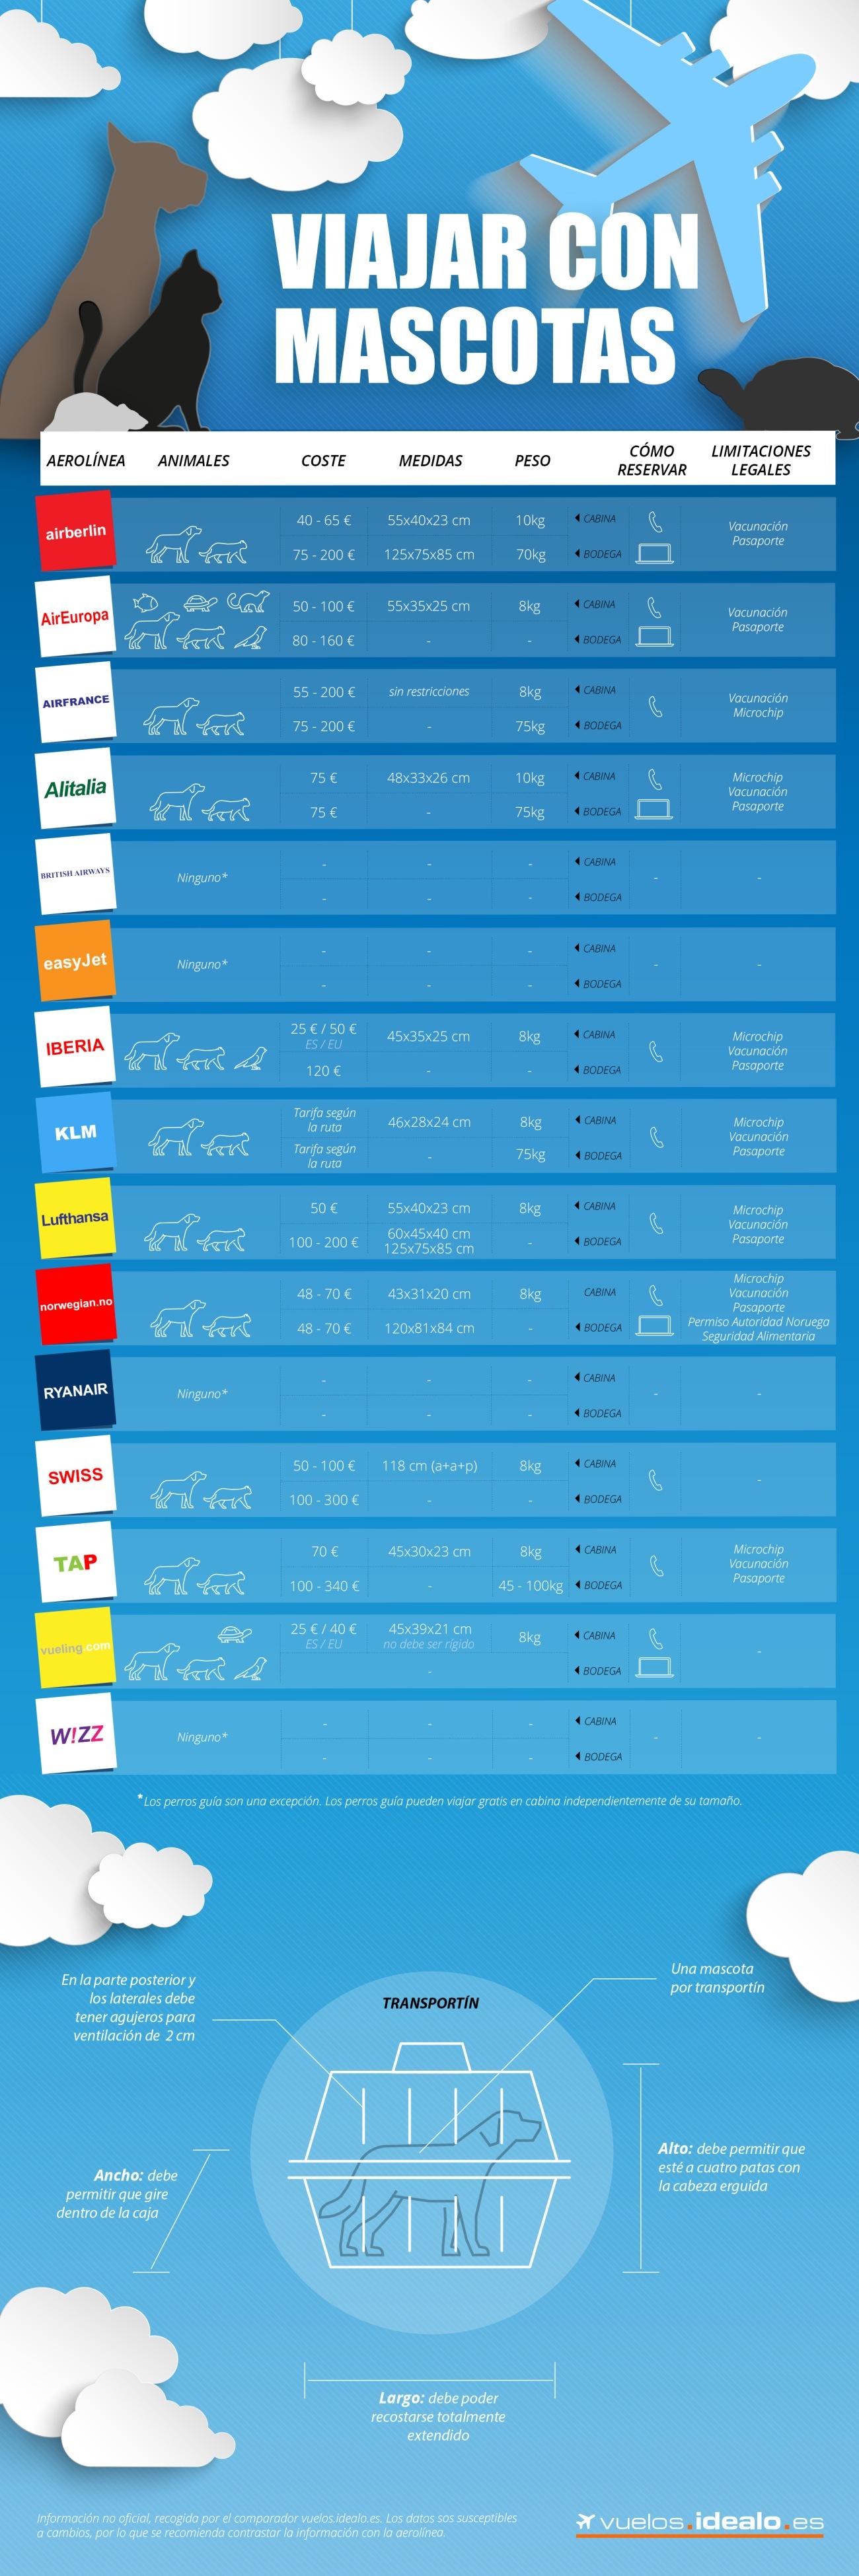 Infografía de compañías aéreas que aceptan animales. Idéalo